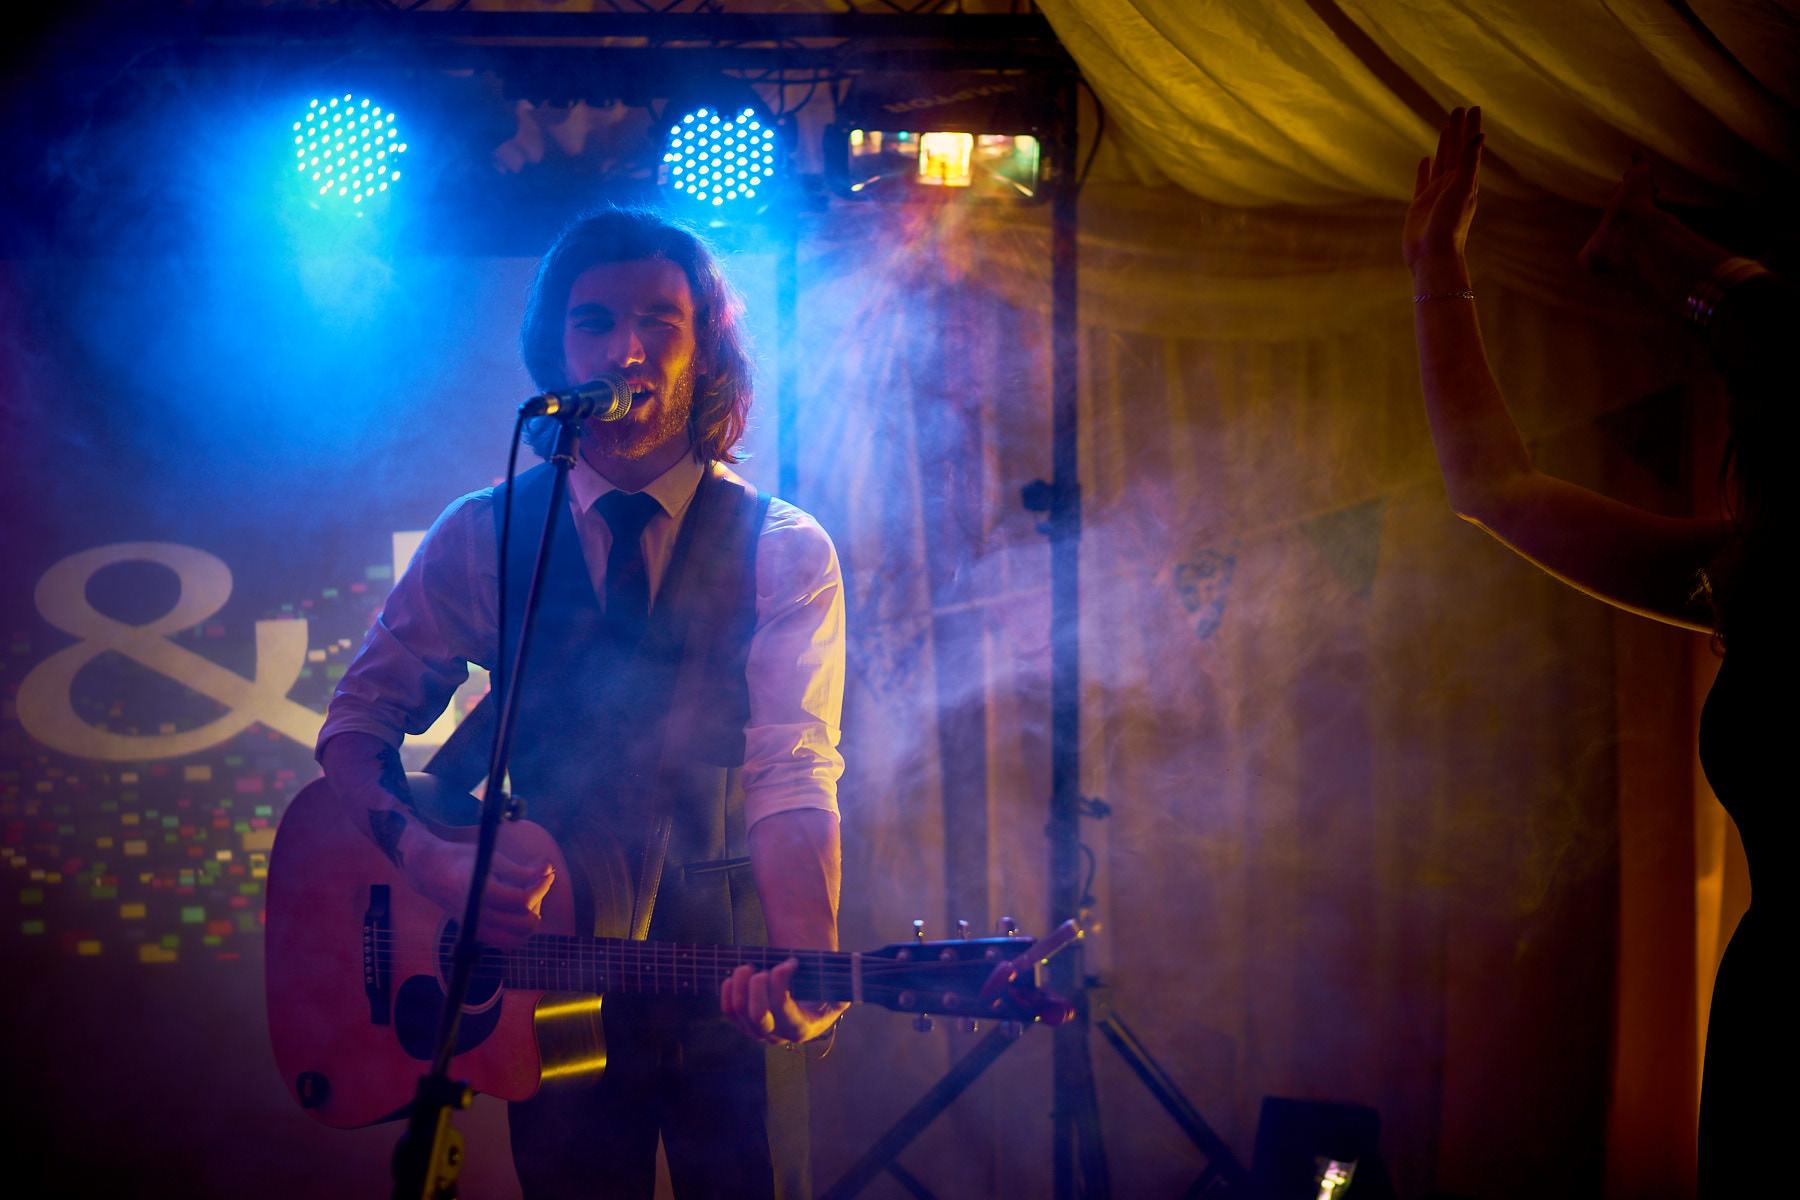 Matt Sloan, Liverpool Singer Songwriter Performing at North Wales Wedding